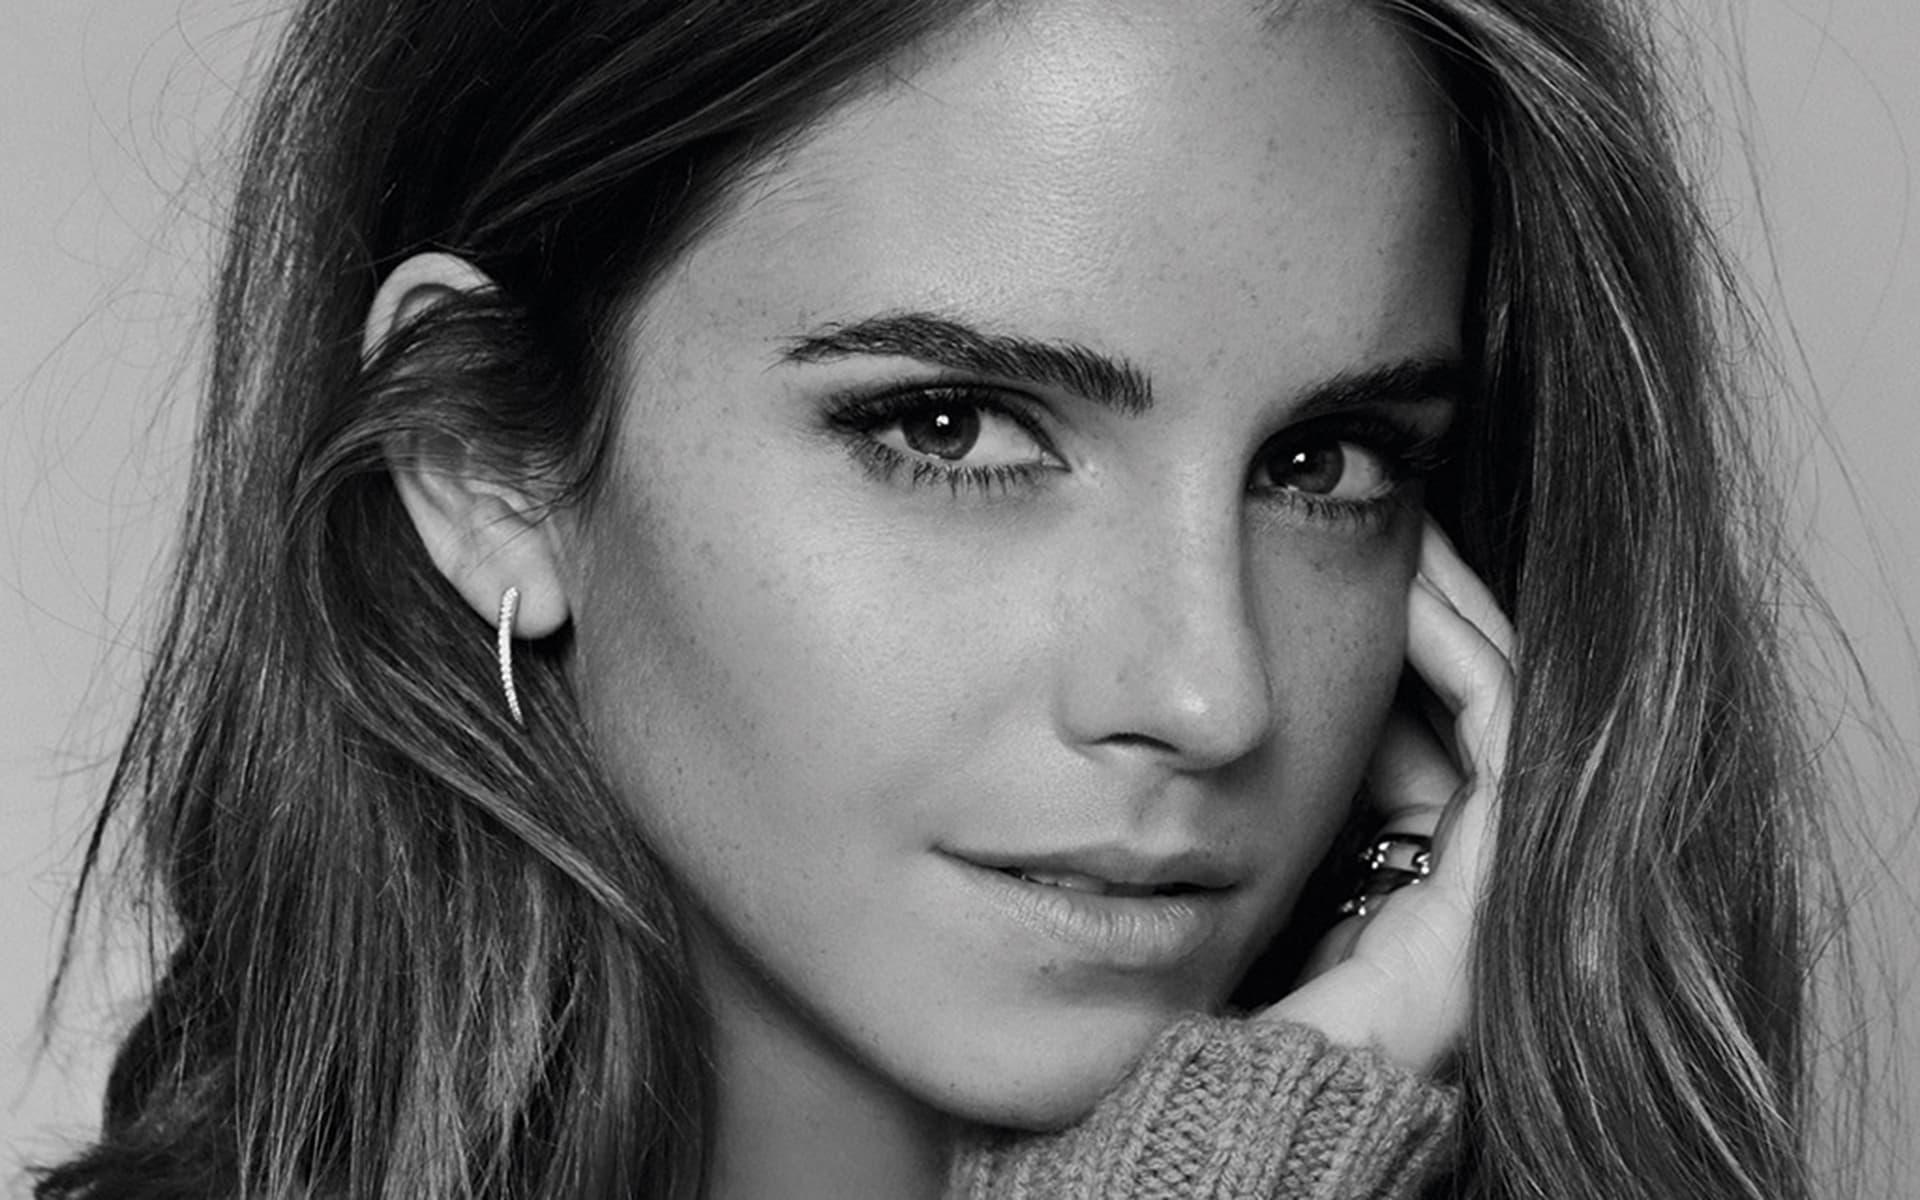 women emma watson actress freckles monochrome start x